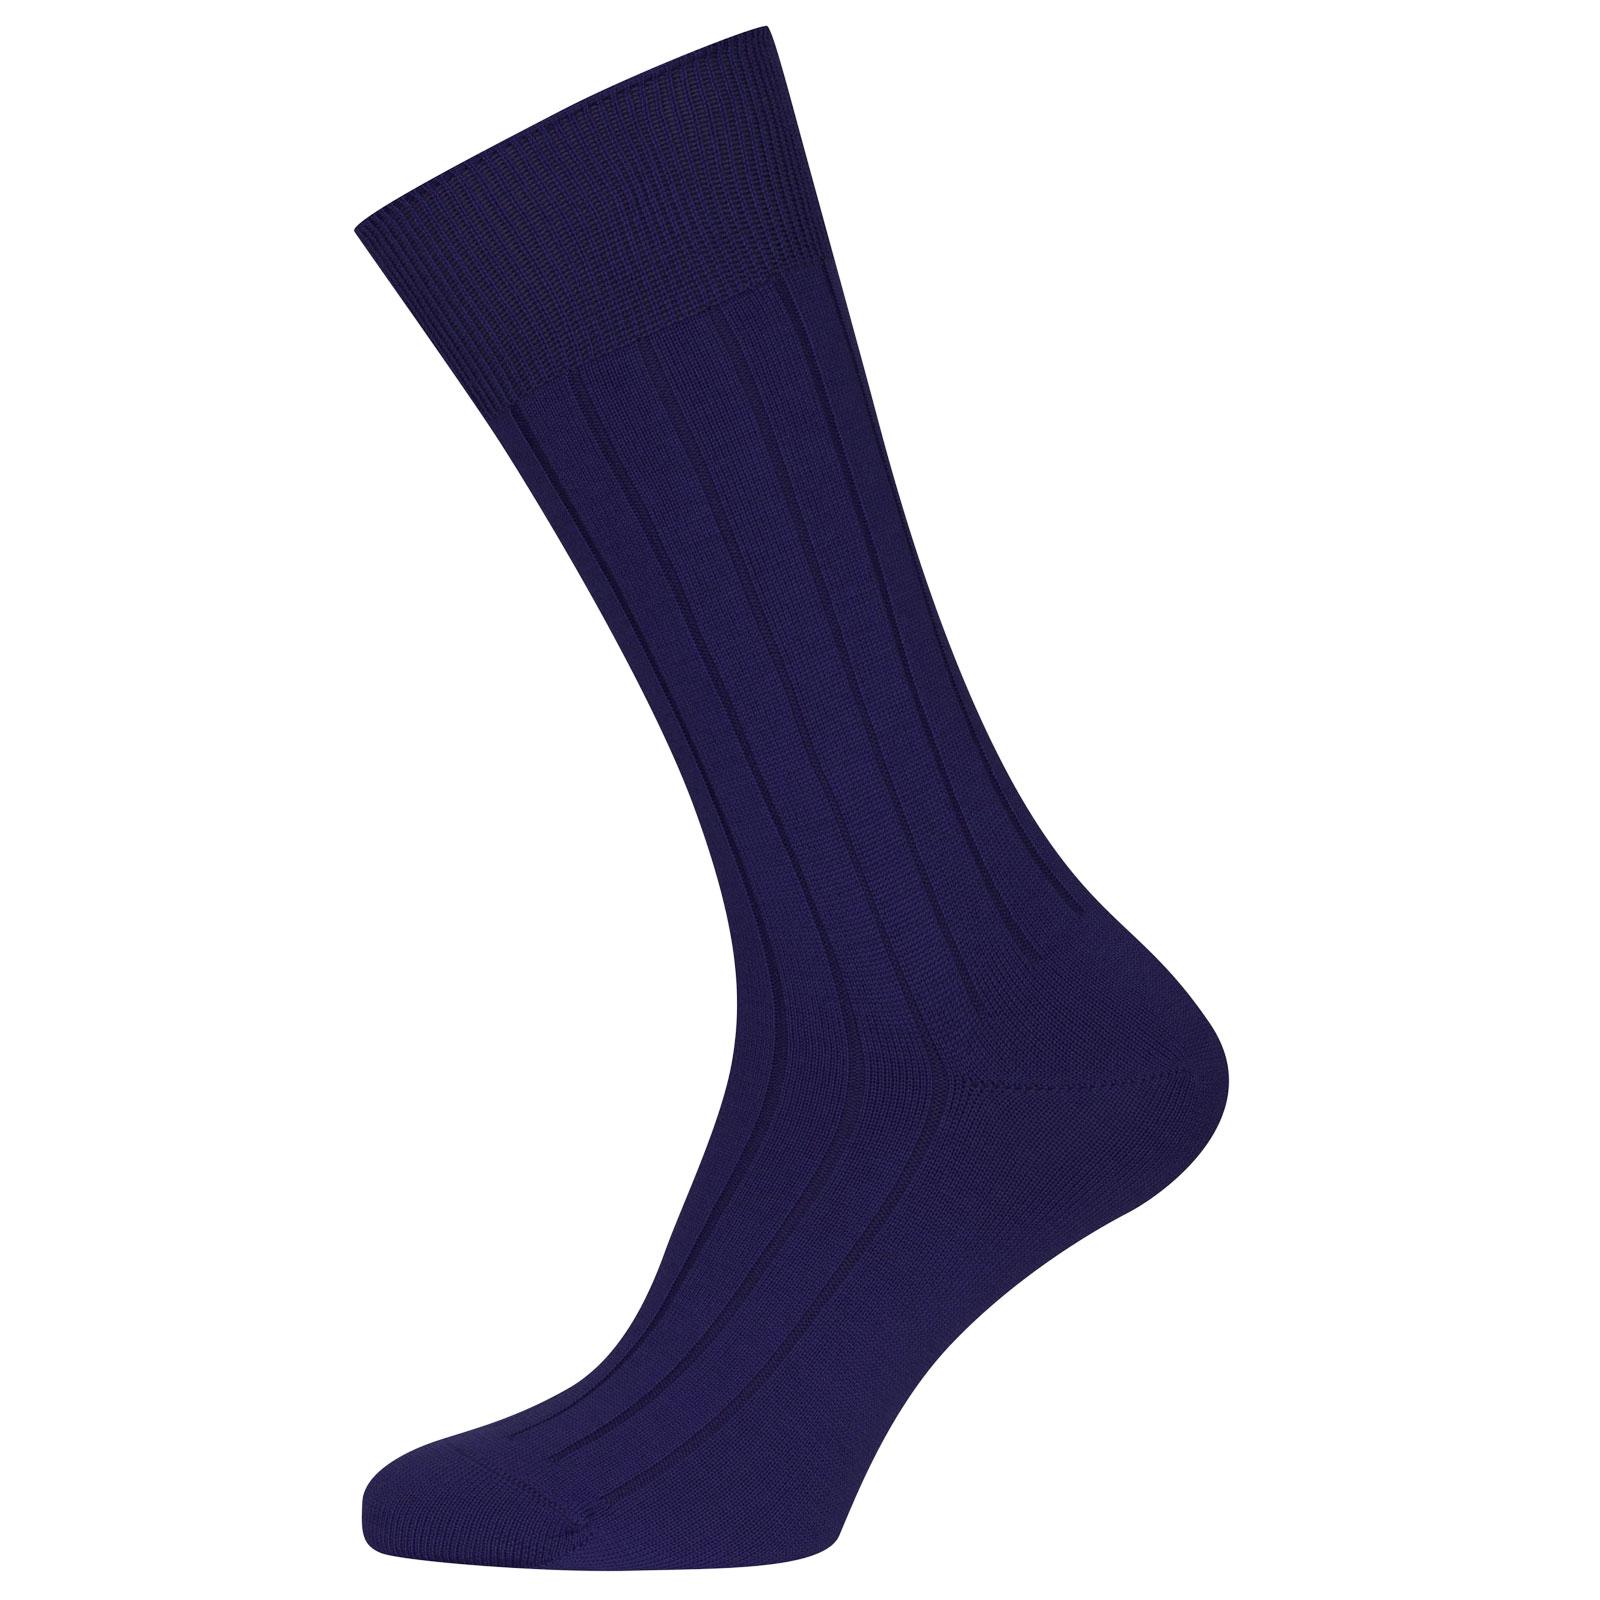 John Smedley Omega Merino Wool Socks in Serge Blue-S/M